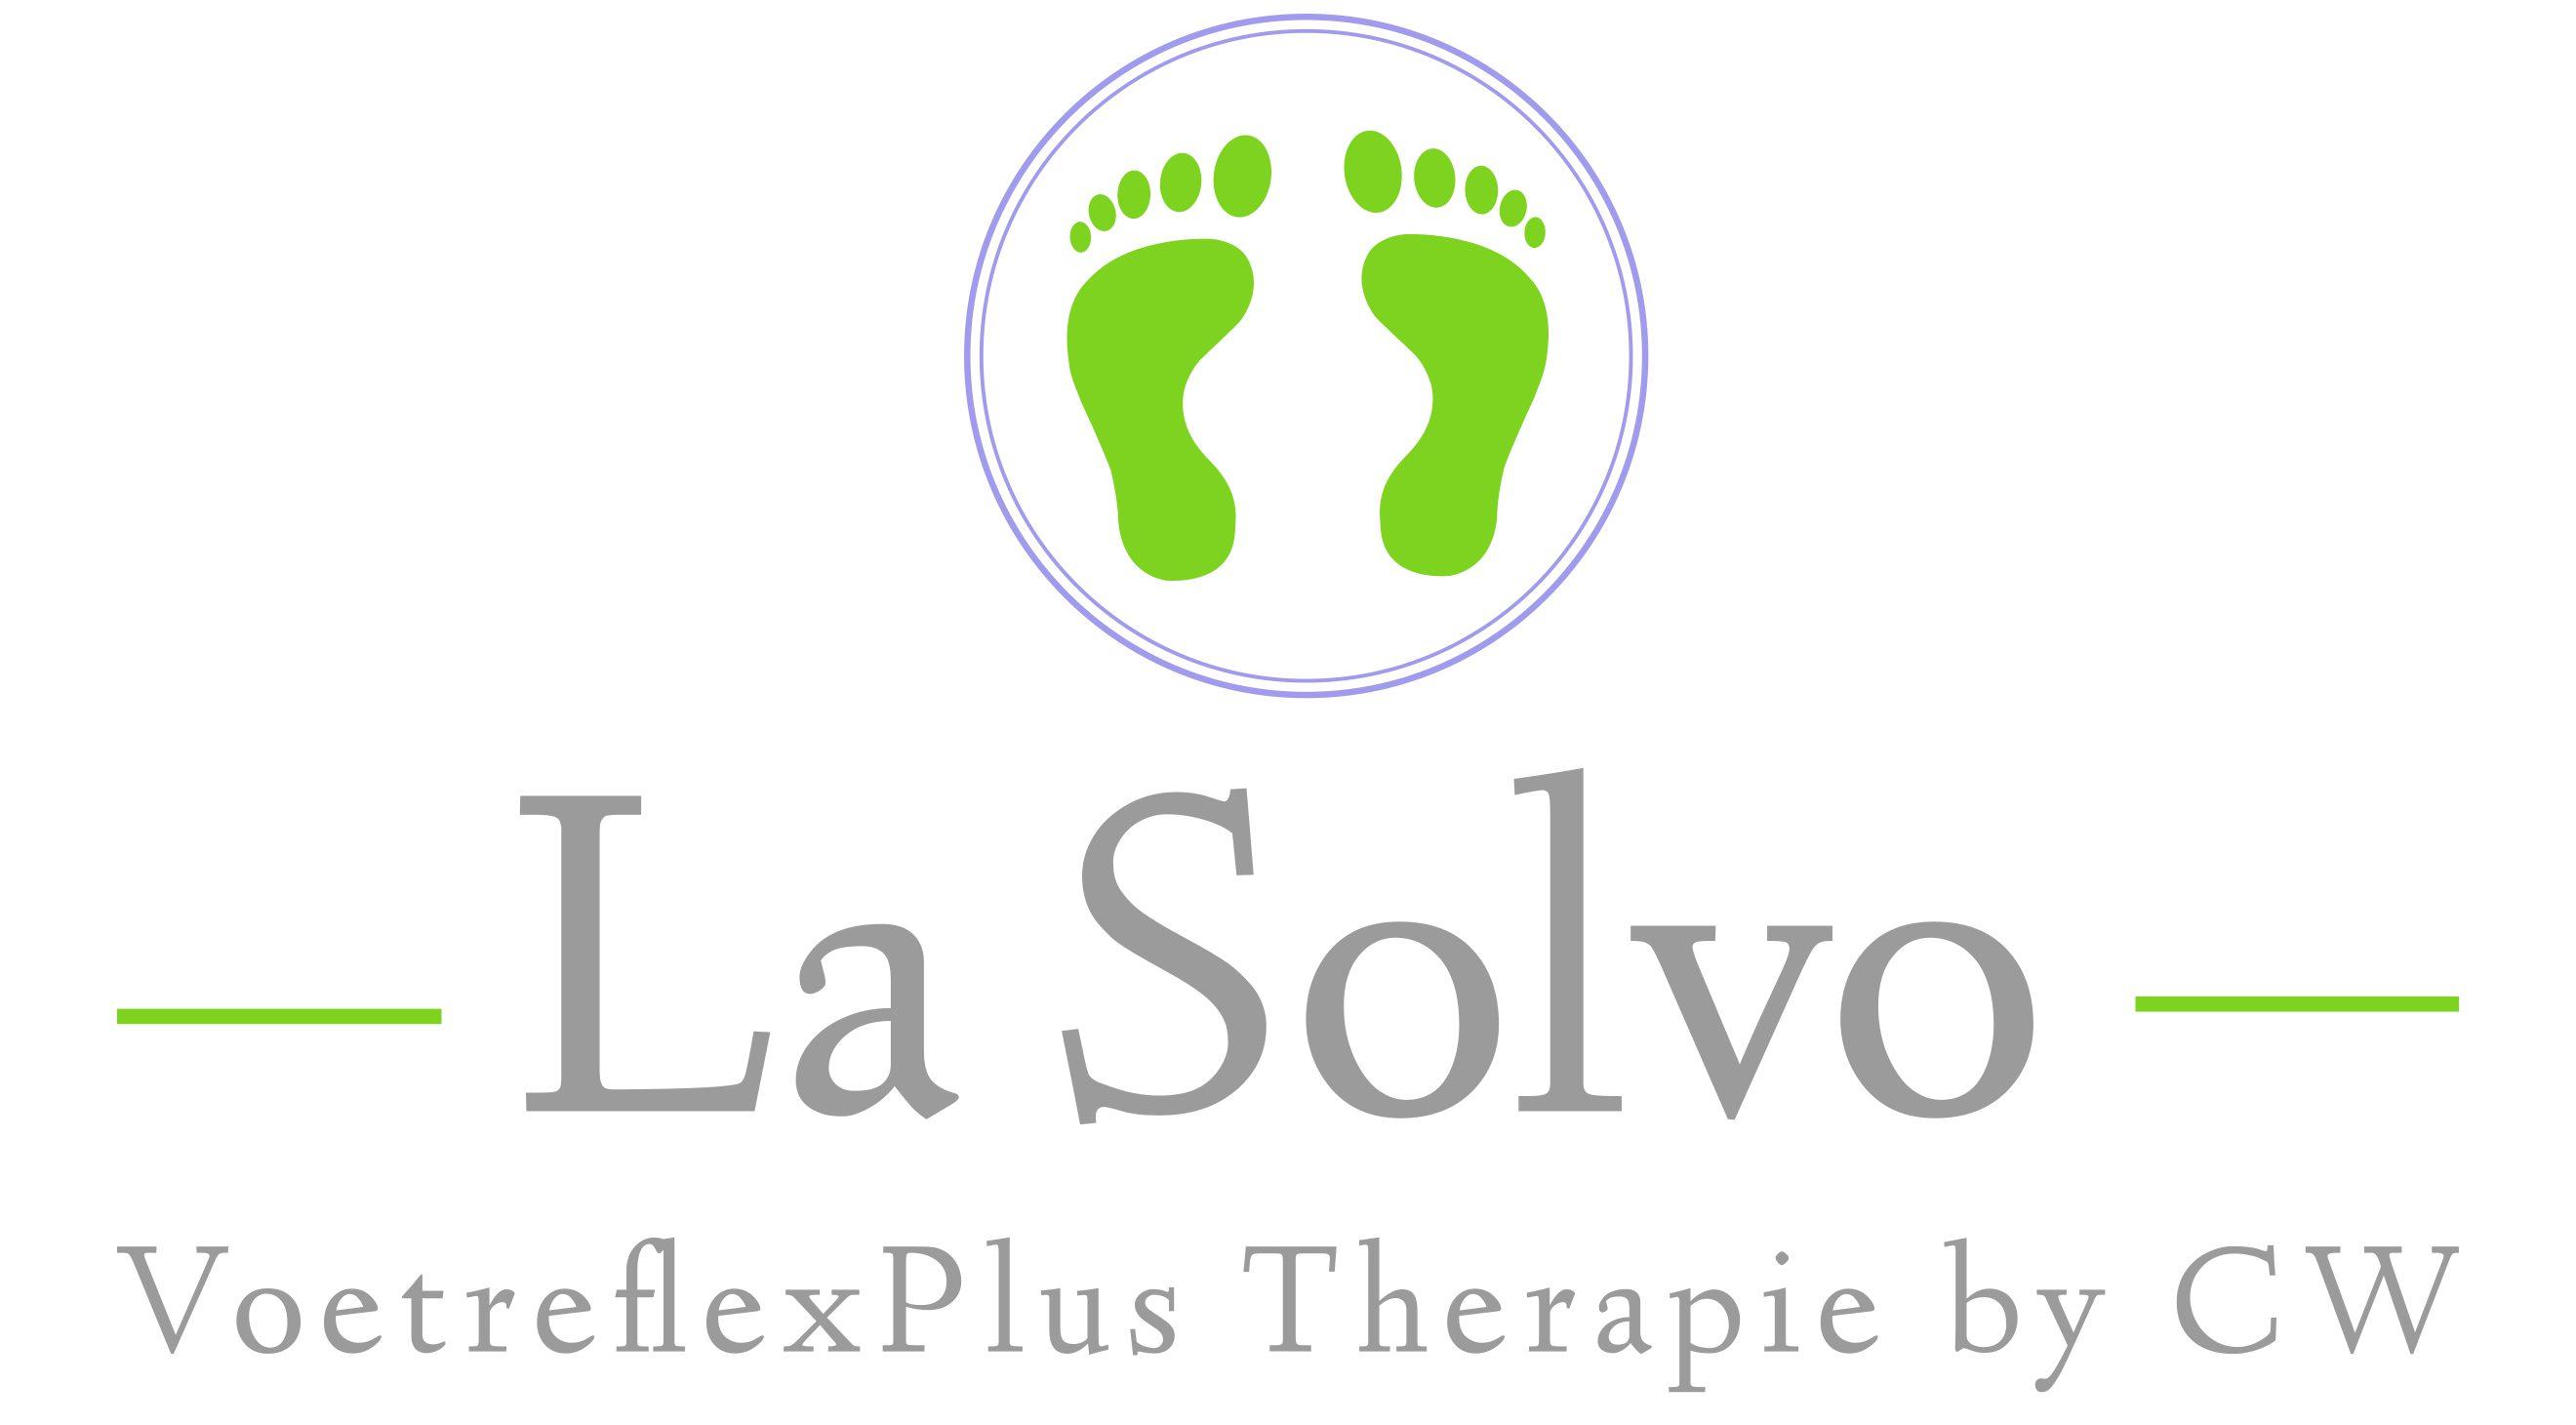 La Solvo VoetreflexPlus by CW